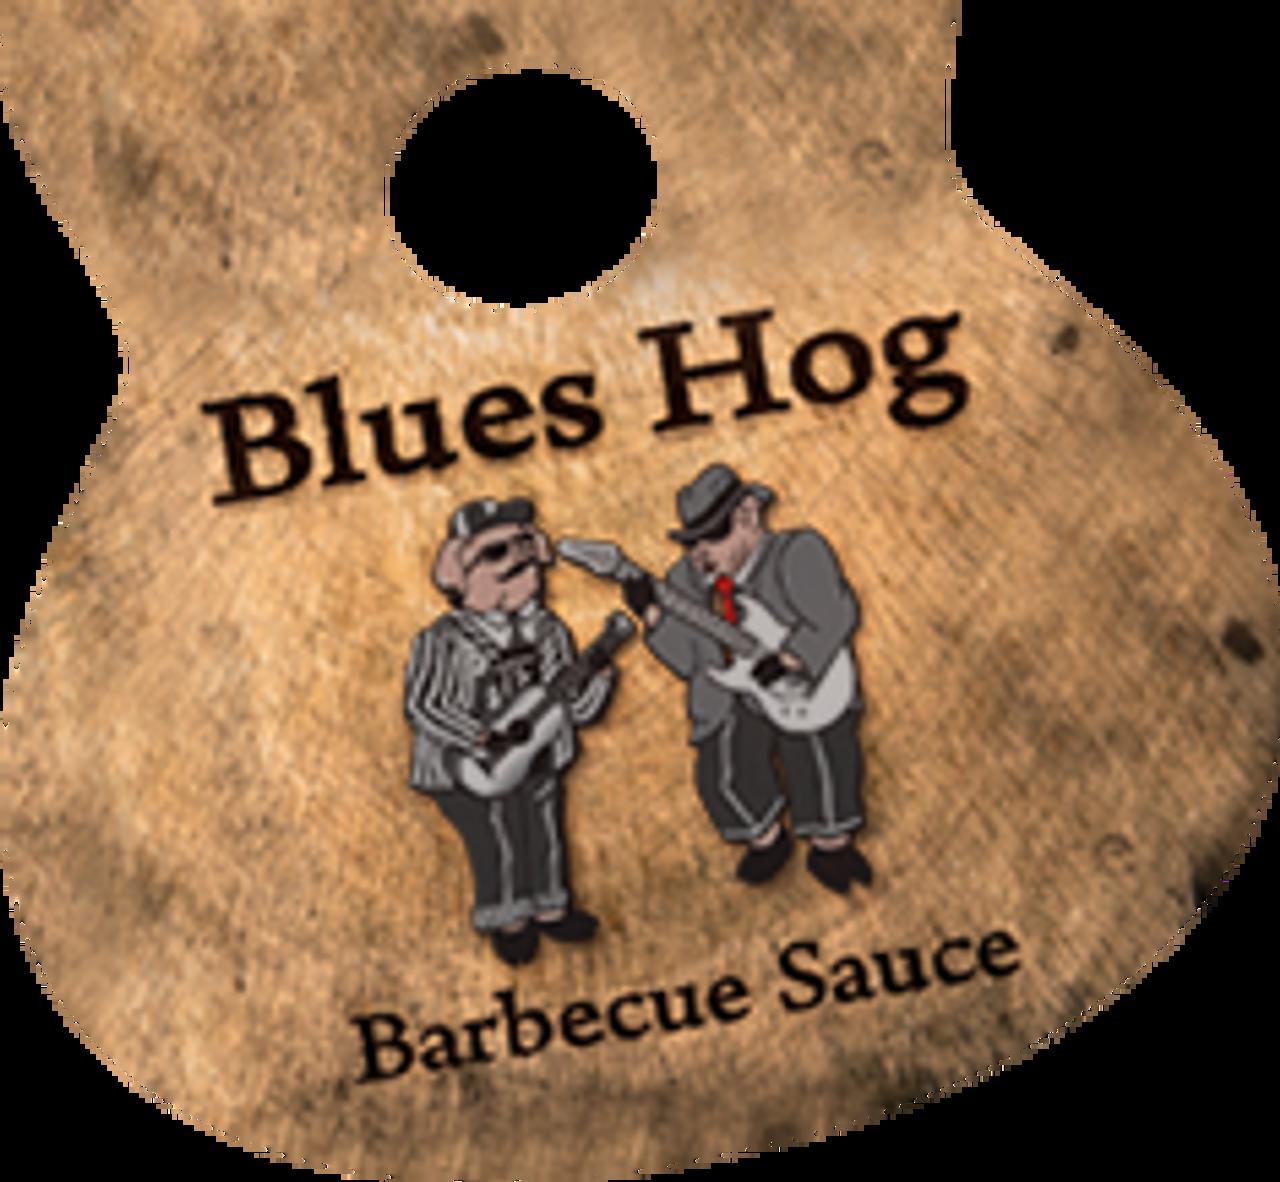 Blues Hog BBQ